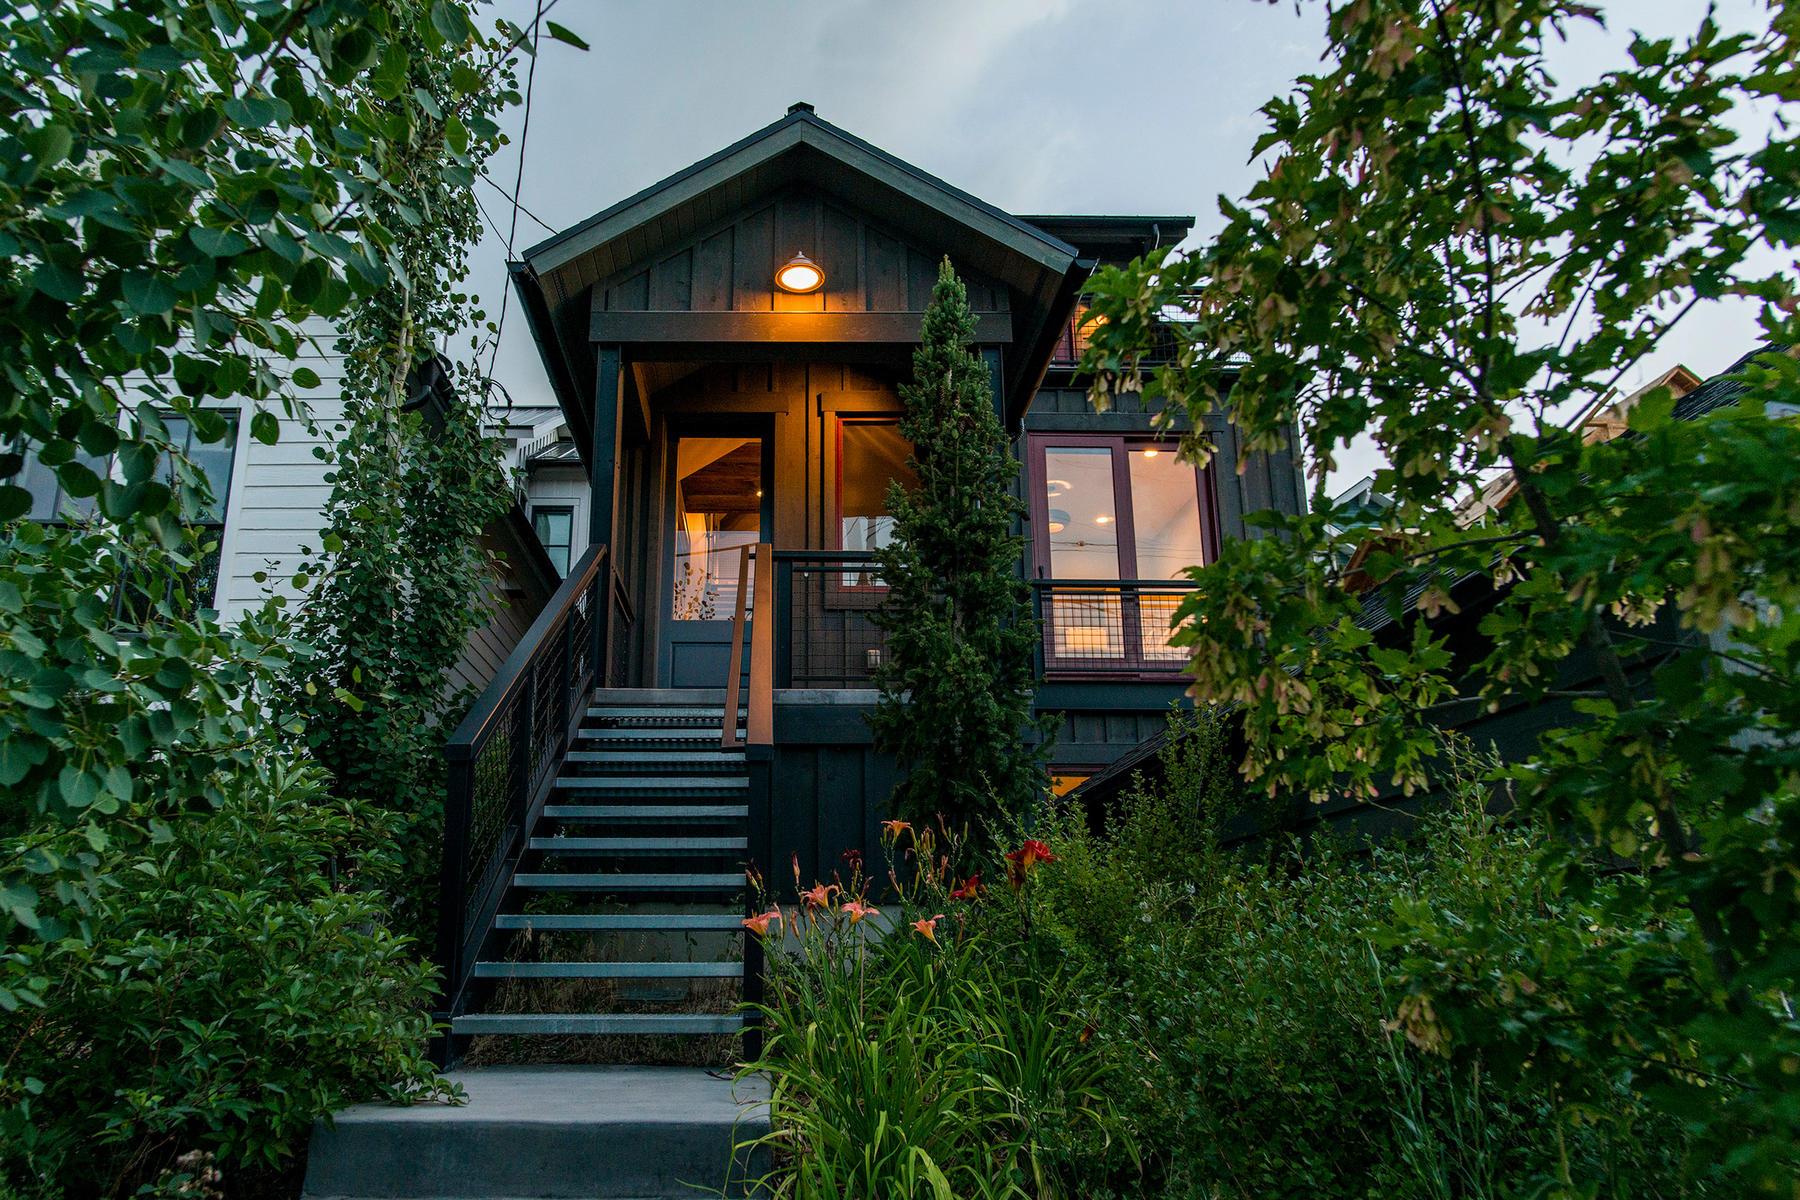 Casa Unifamiliar por un Venta en Ultimate Old Town Retreat With Irreplaceable Setting Just Steps to the Ski Run 817 Norfolk Ave Park City, Utah, 84060 Estados Unidos